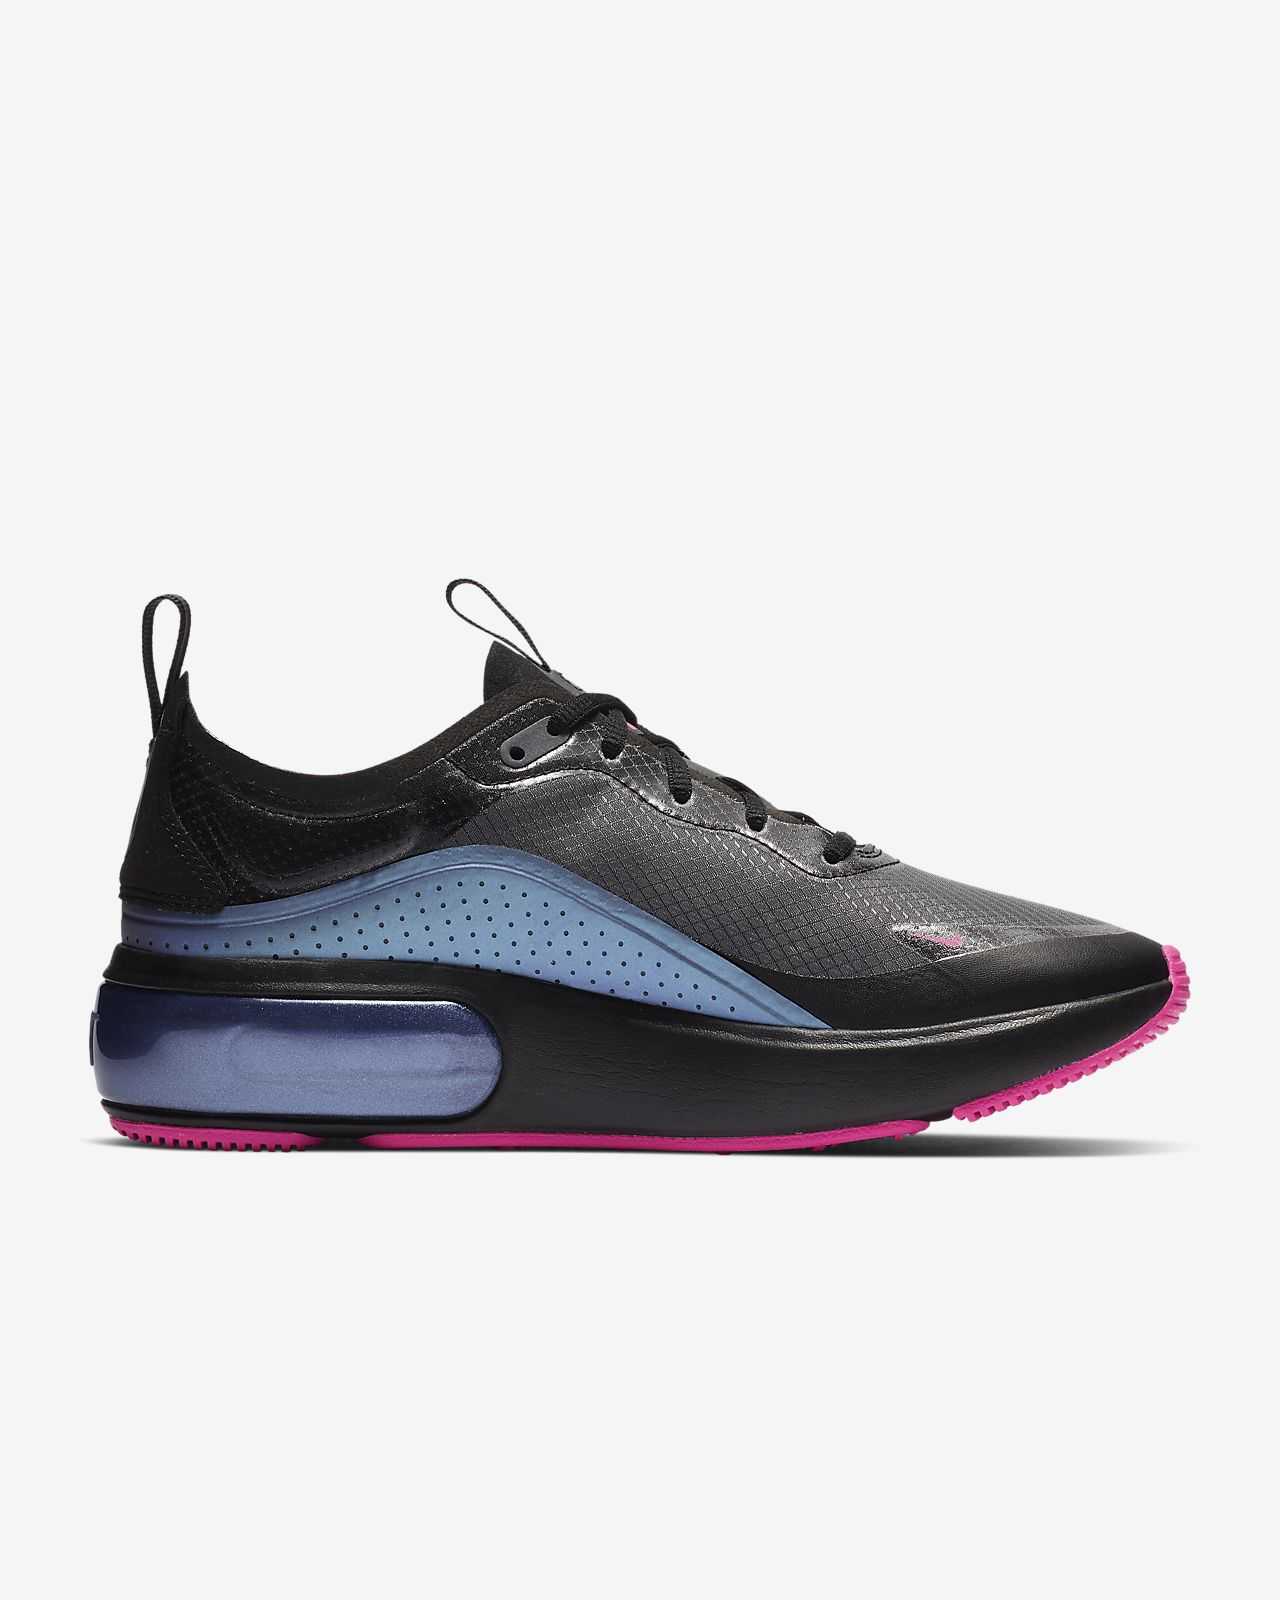 online store 59041 7b801 ... Chaussure Nike Air Max Dia SE